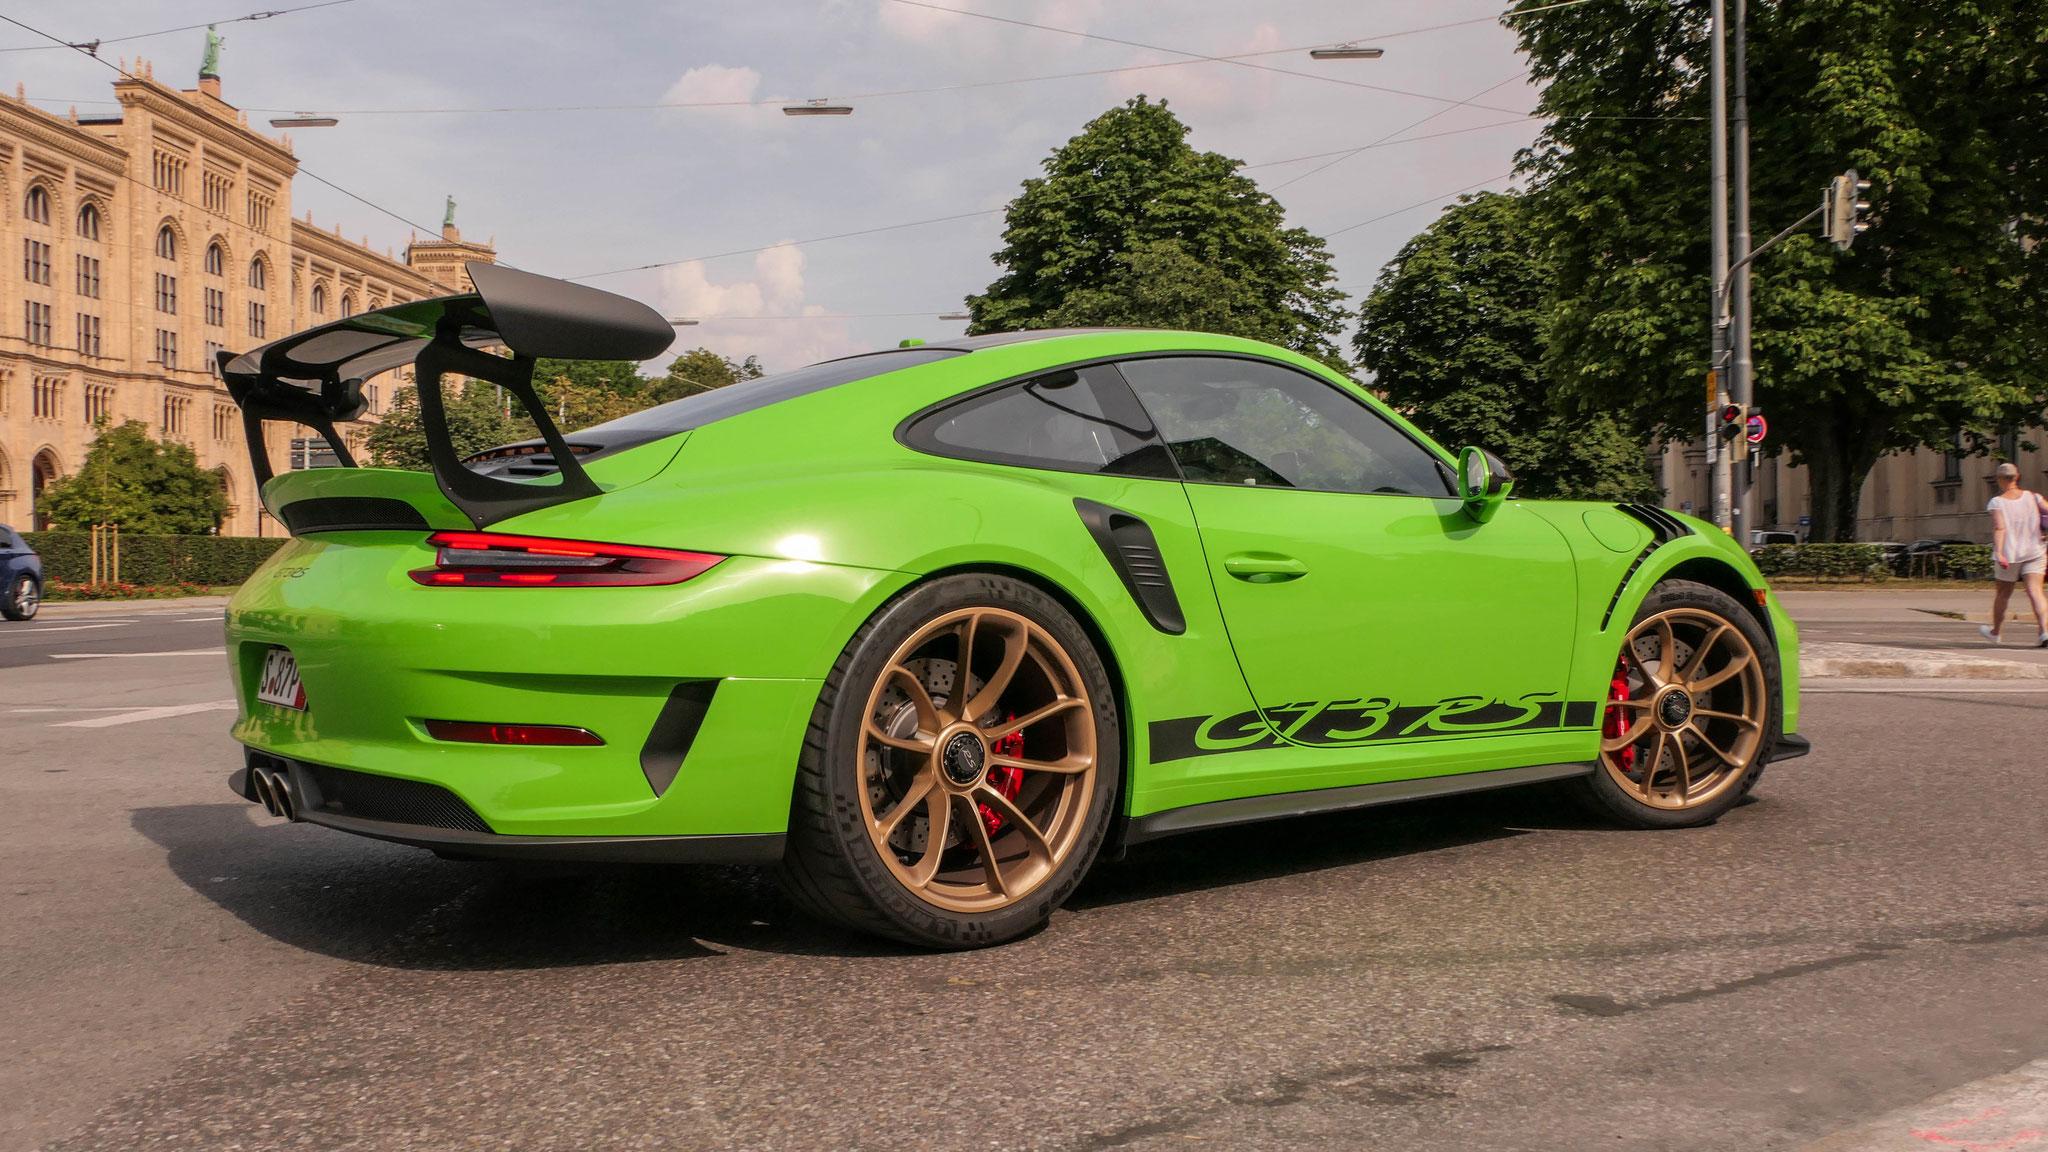 Porsche 911 991.2 GT3 RS - S-87-P